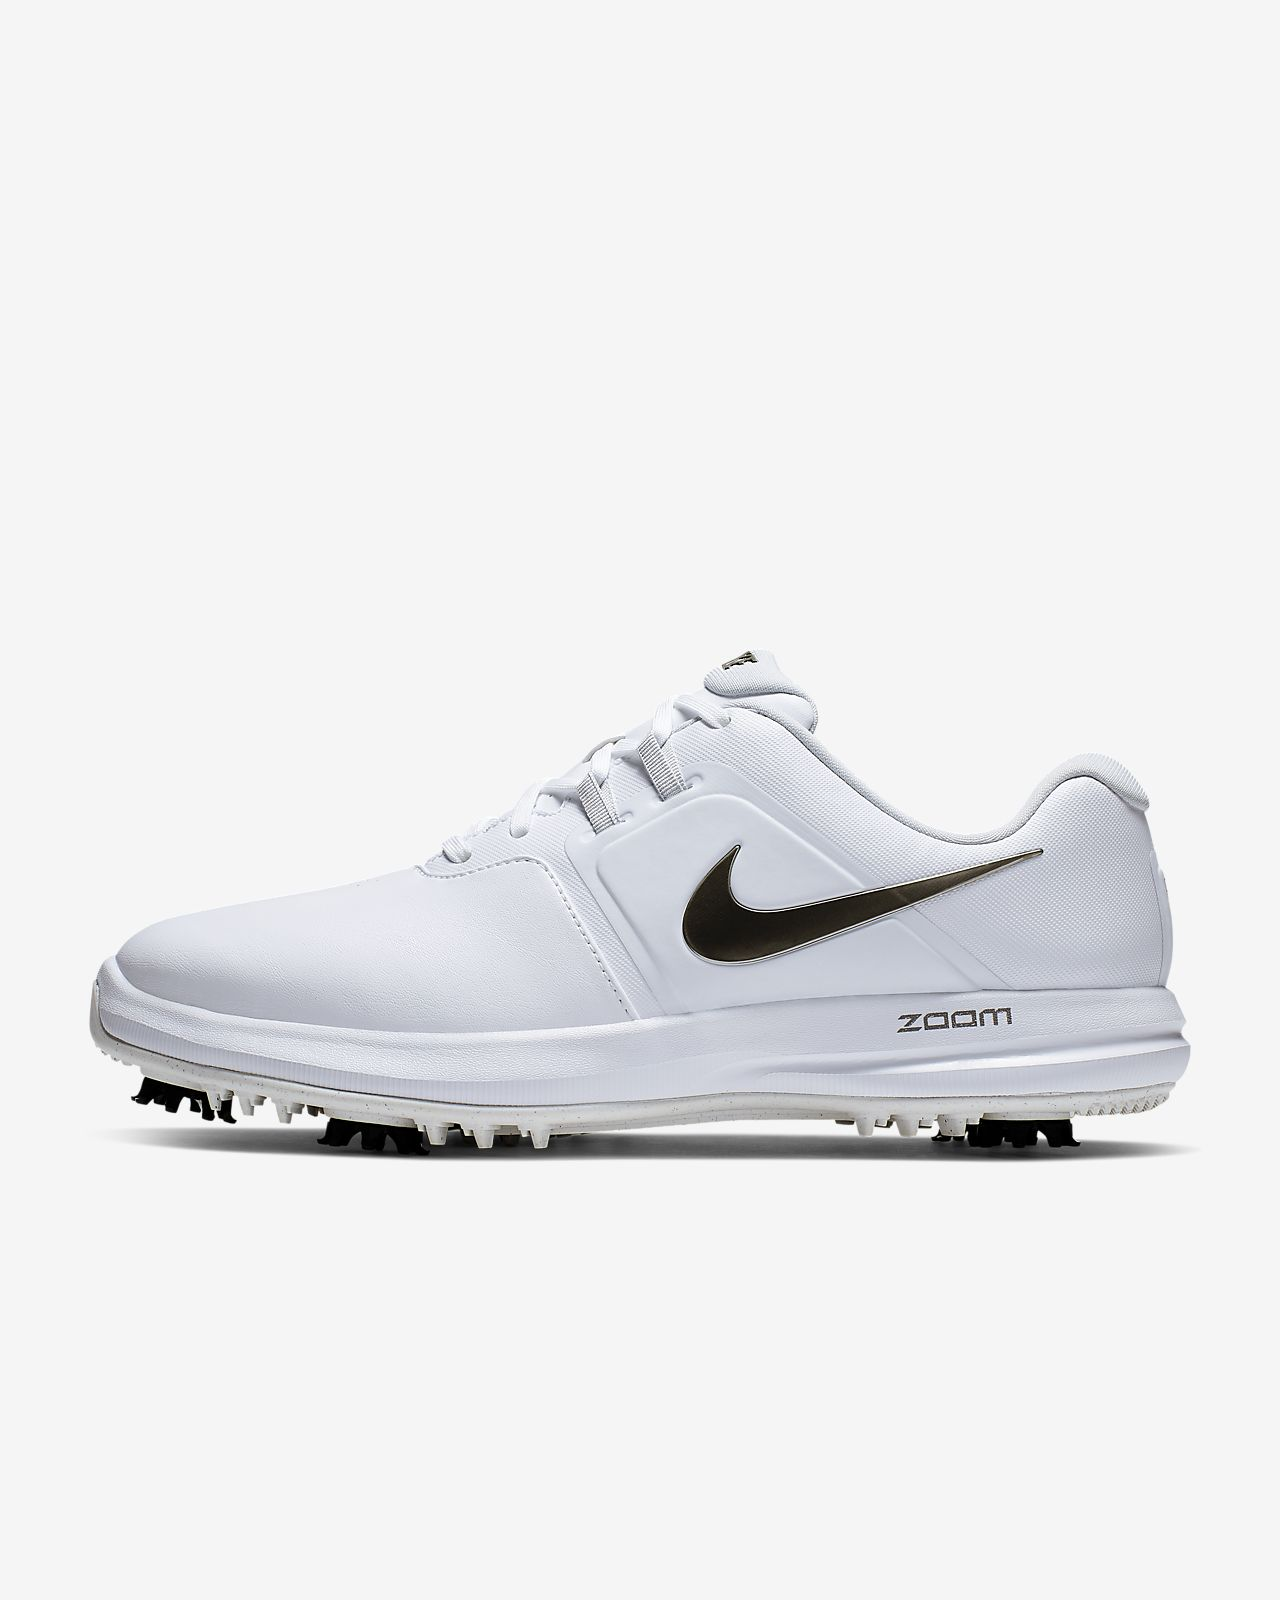 8d3daeb863ff25 Nike Air Zoom Victory Men s Golf Shoe (Wide). Nike.com